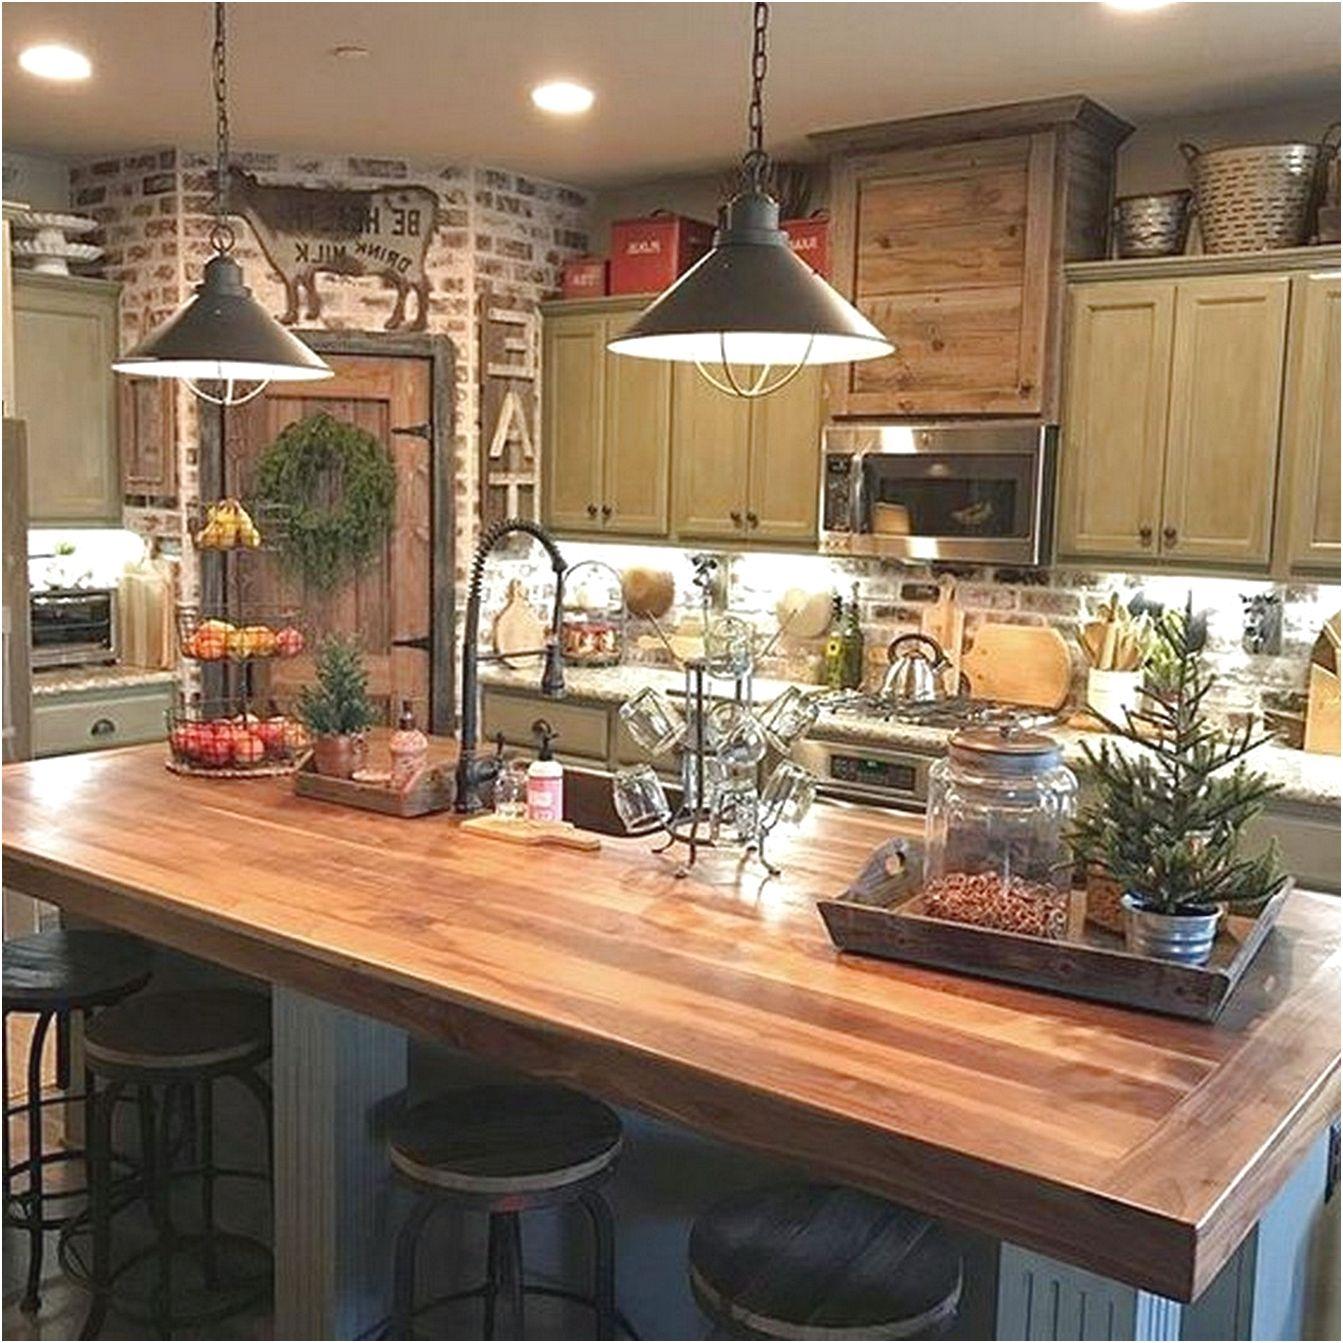 49 Affordable Contemporary Farmhouse Designs Ideas For ... on Farmhouse Rustic Kitchen Ideas  id=48665